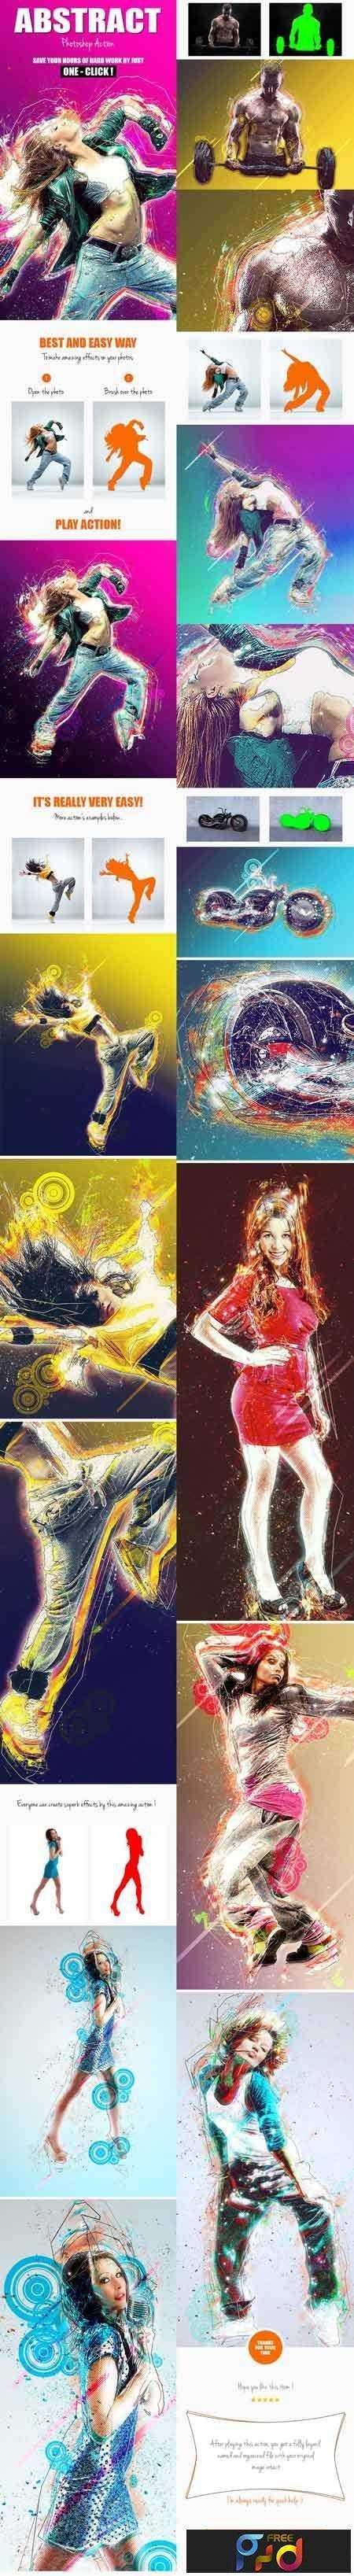 FreePsdVn.com_1702004_PHOTOSHOP_abstract_photoshop_action_16824552